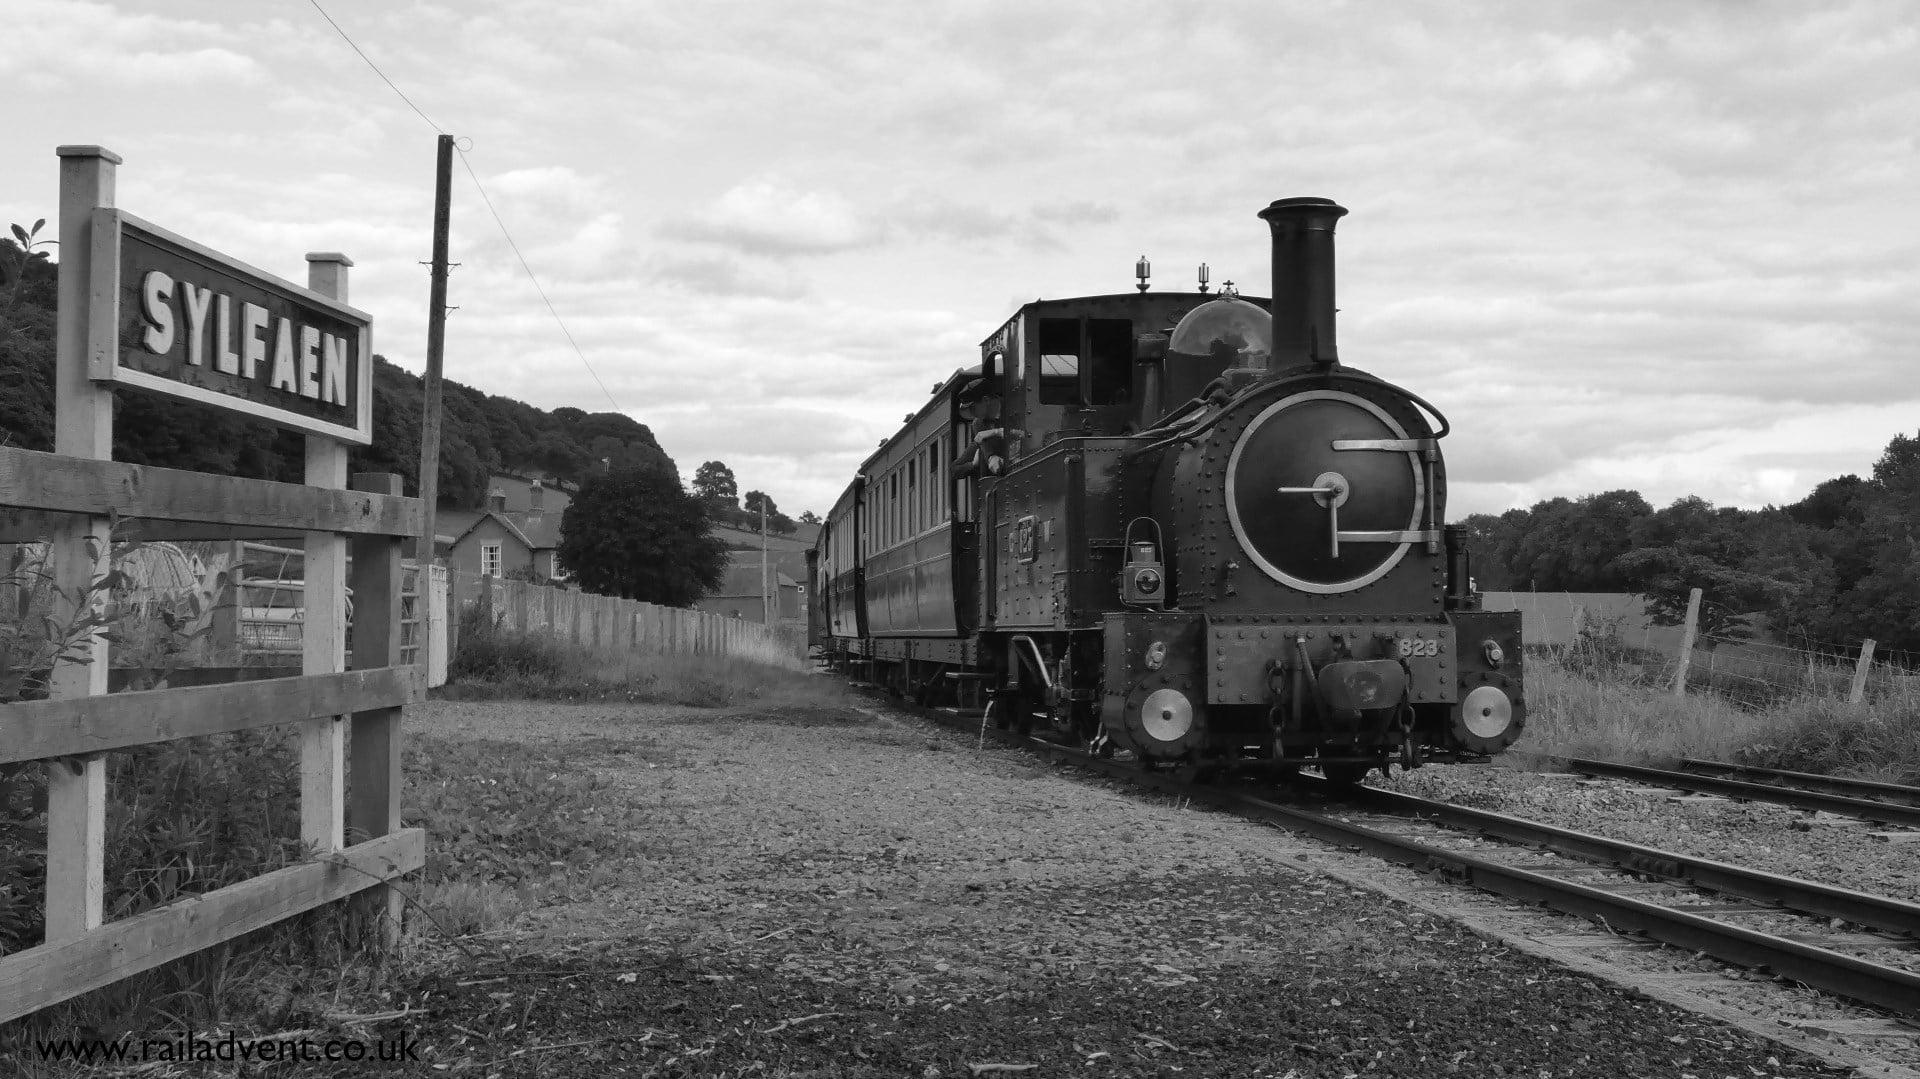 823 at Sylfaen on the Welshpool & Llanfair Railway during Steam Gala 2017